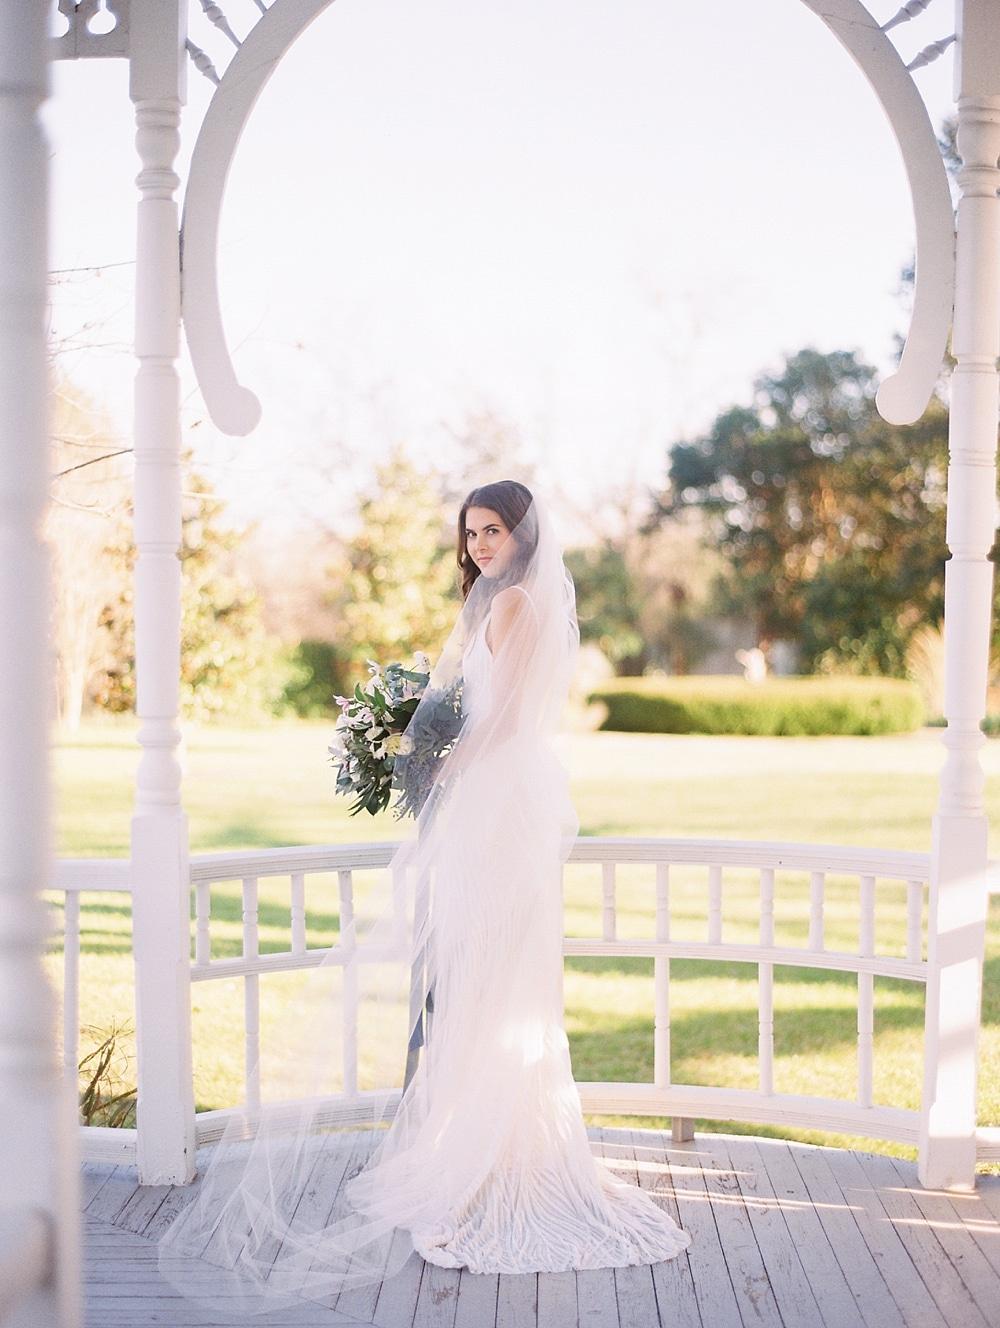 Kristin-La-Voie-Photography-Austin-Wedding-Photographer-barr-mansion (6 of 86)